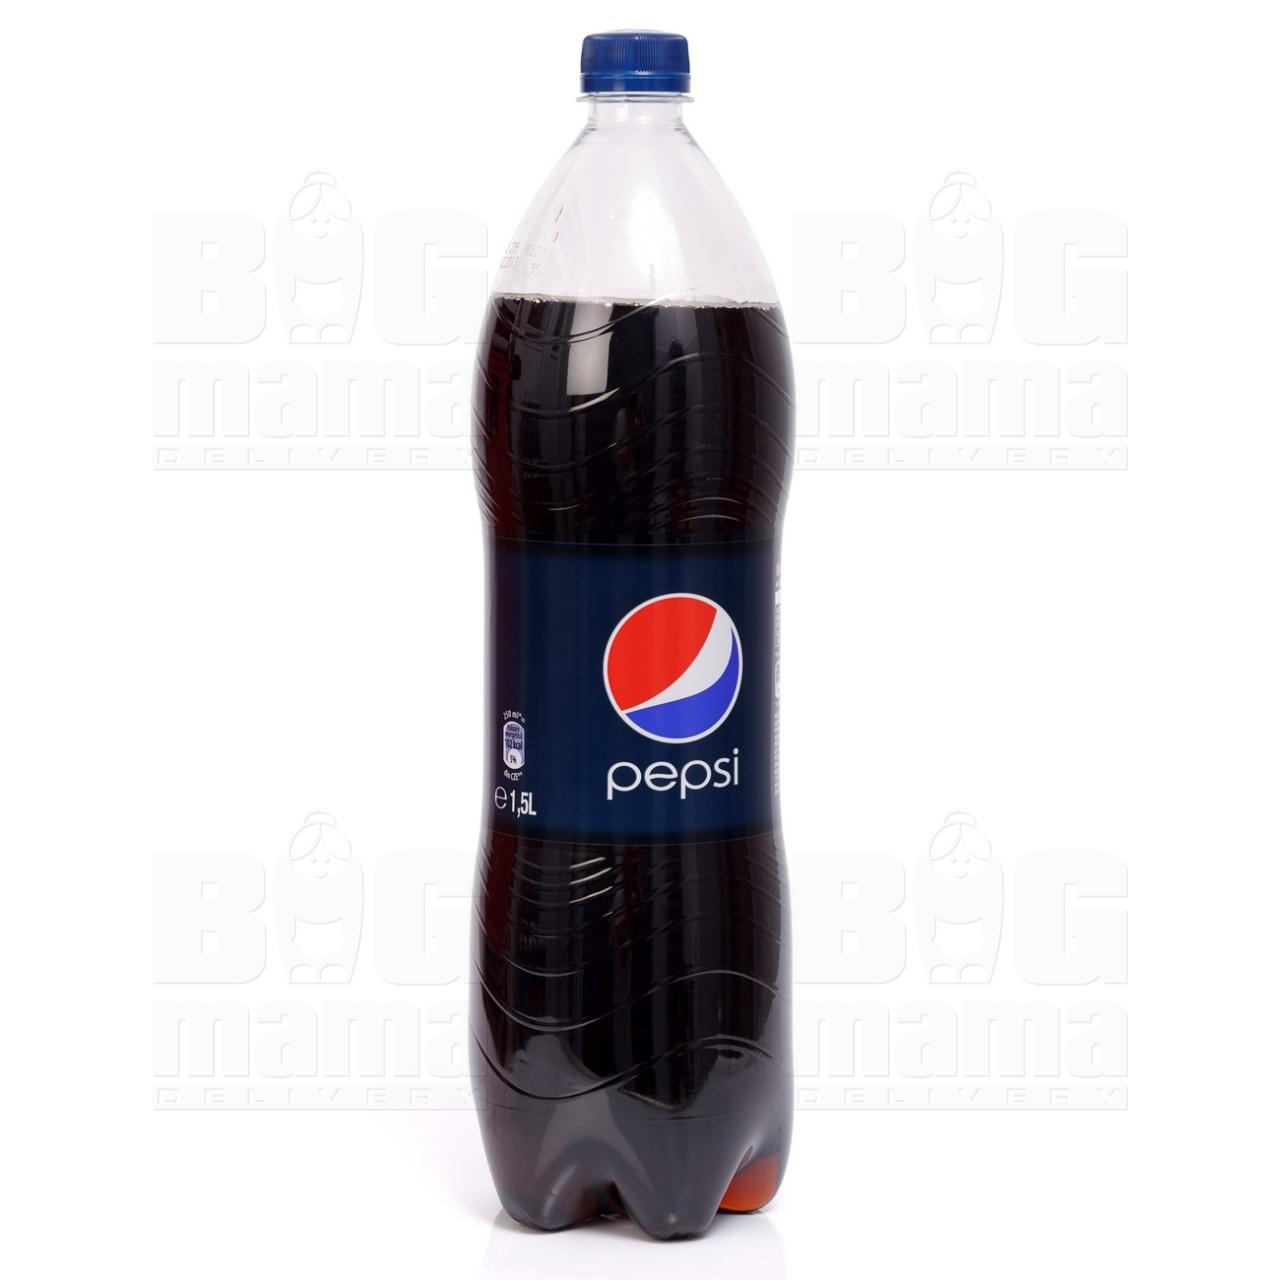 Product #92 image - Pepsi 1,5L